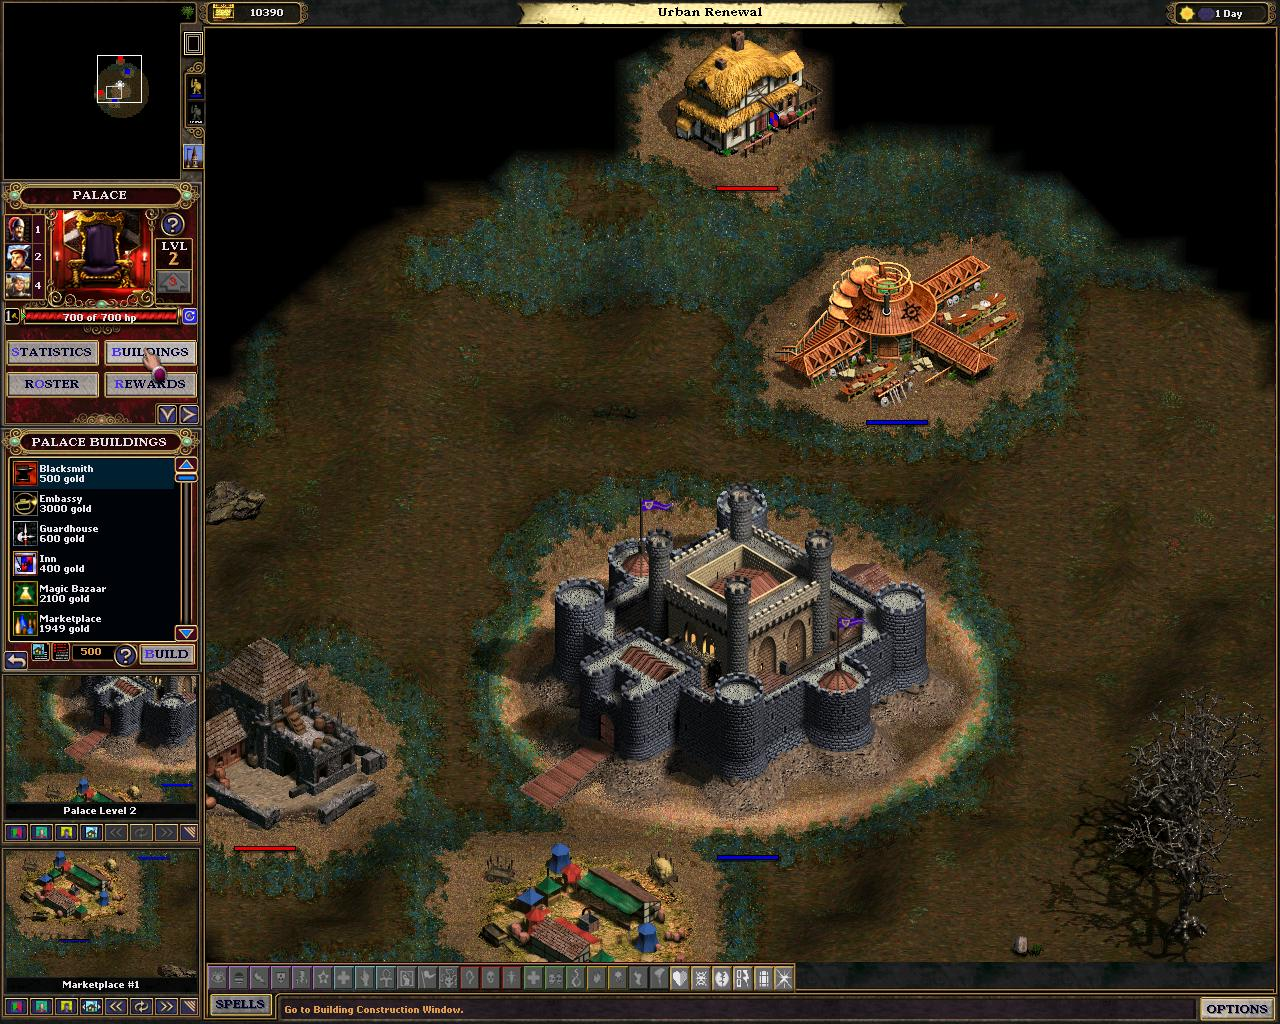 ss 68c37cea8de7fd929ad6f99697221f536bc9bf99 - Rewind Review - Majesty Gold HD